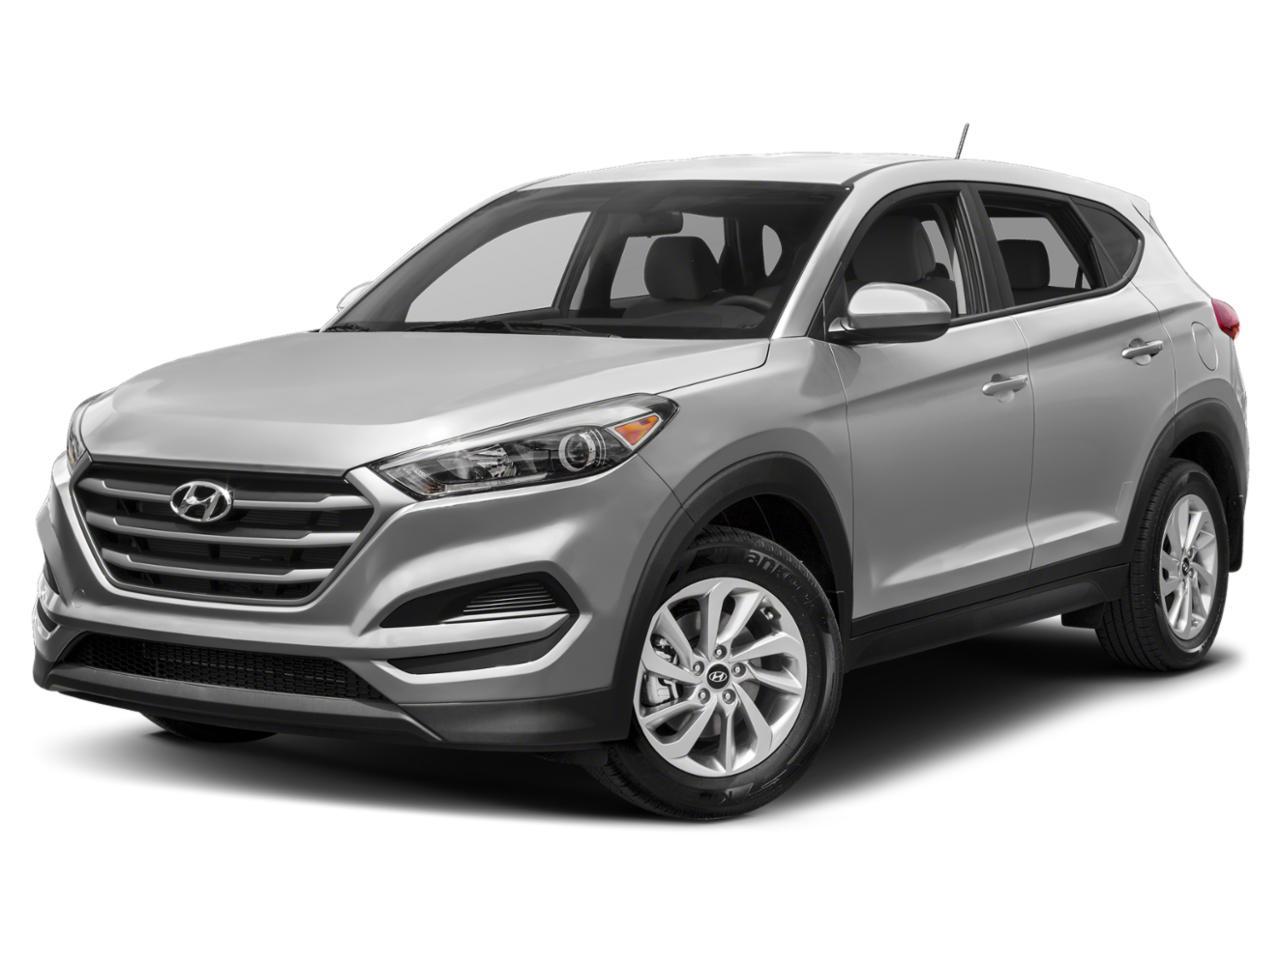 2018 Hyundai Tucson Vehicle Photo in Appleton, WI 54913